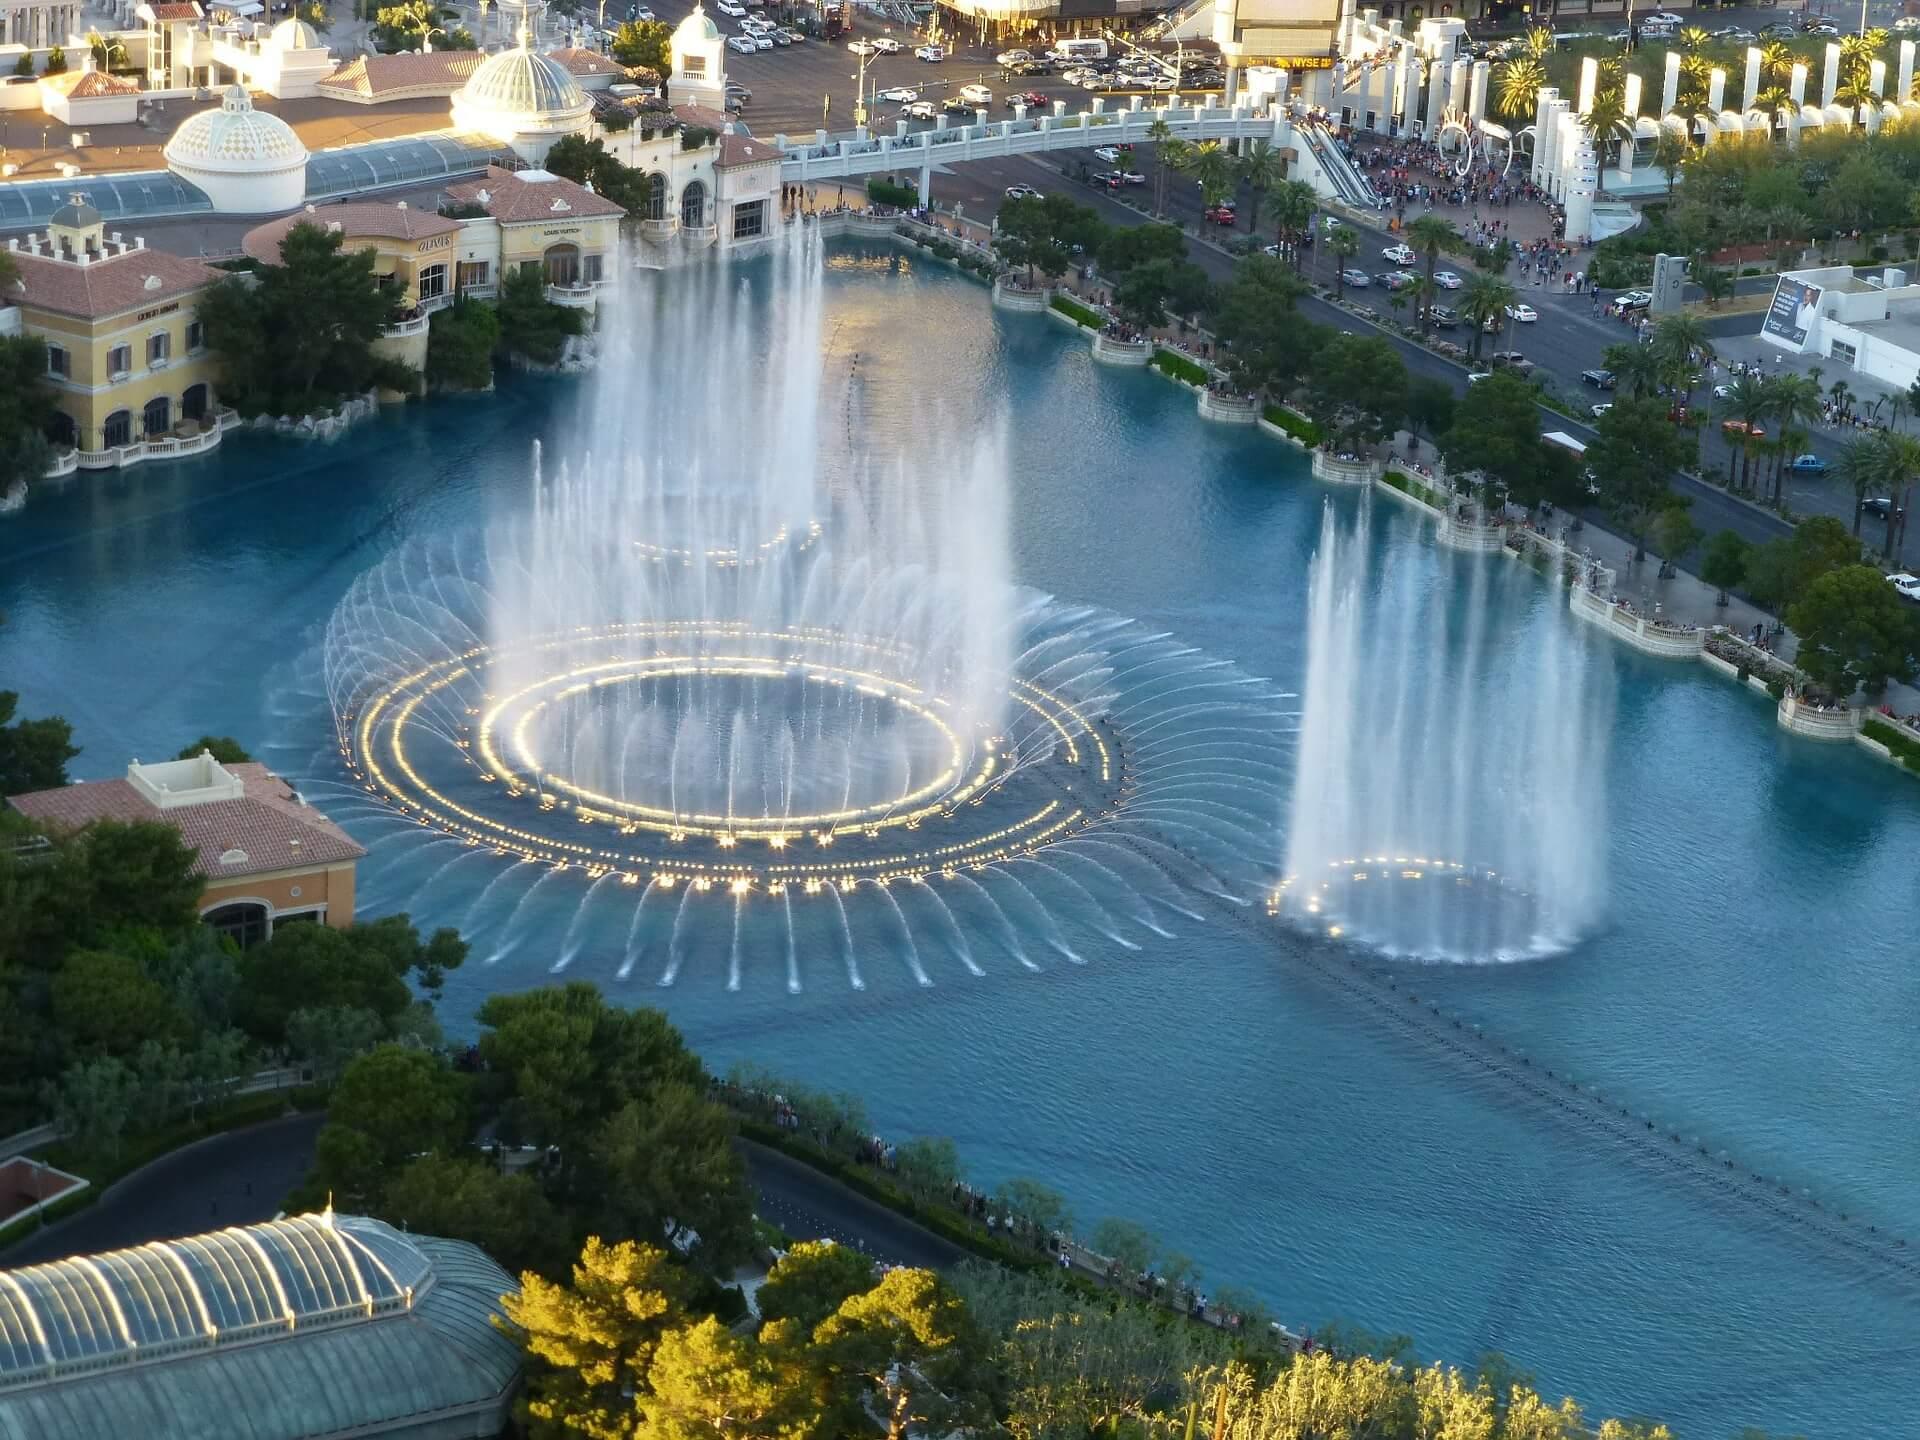 fountains-105508_1920 (1)